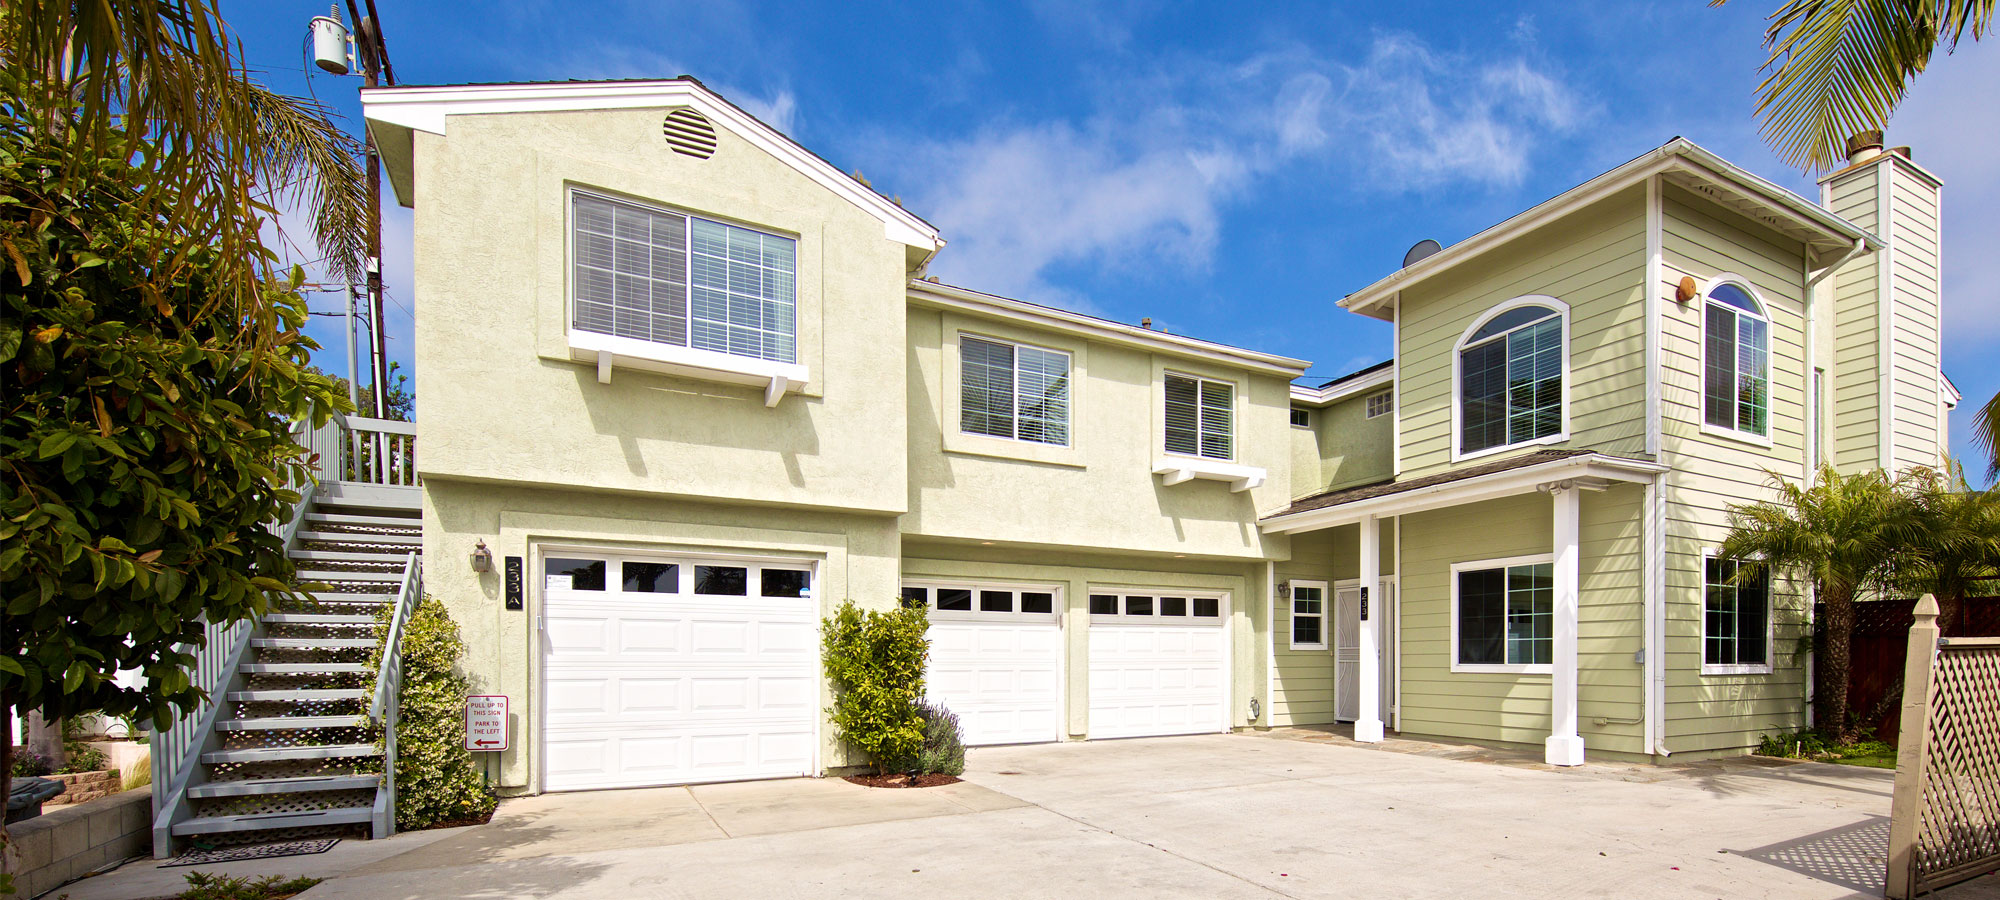 233 N Vulcan Ave, Encinitas, CA 92024